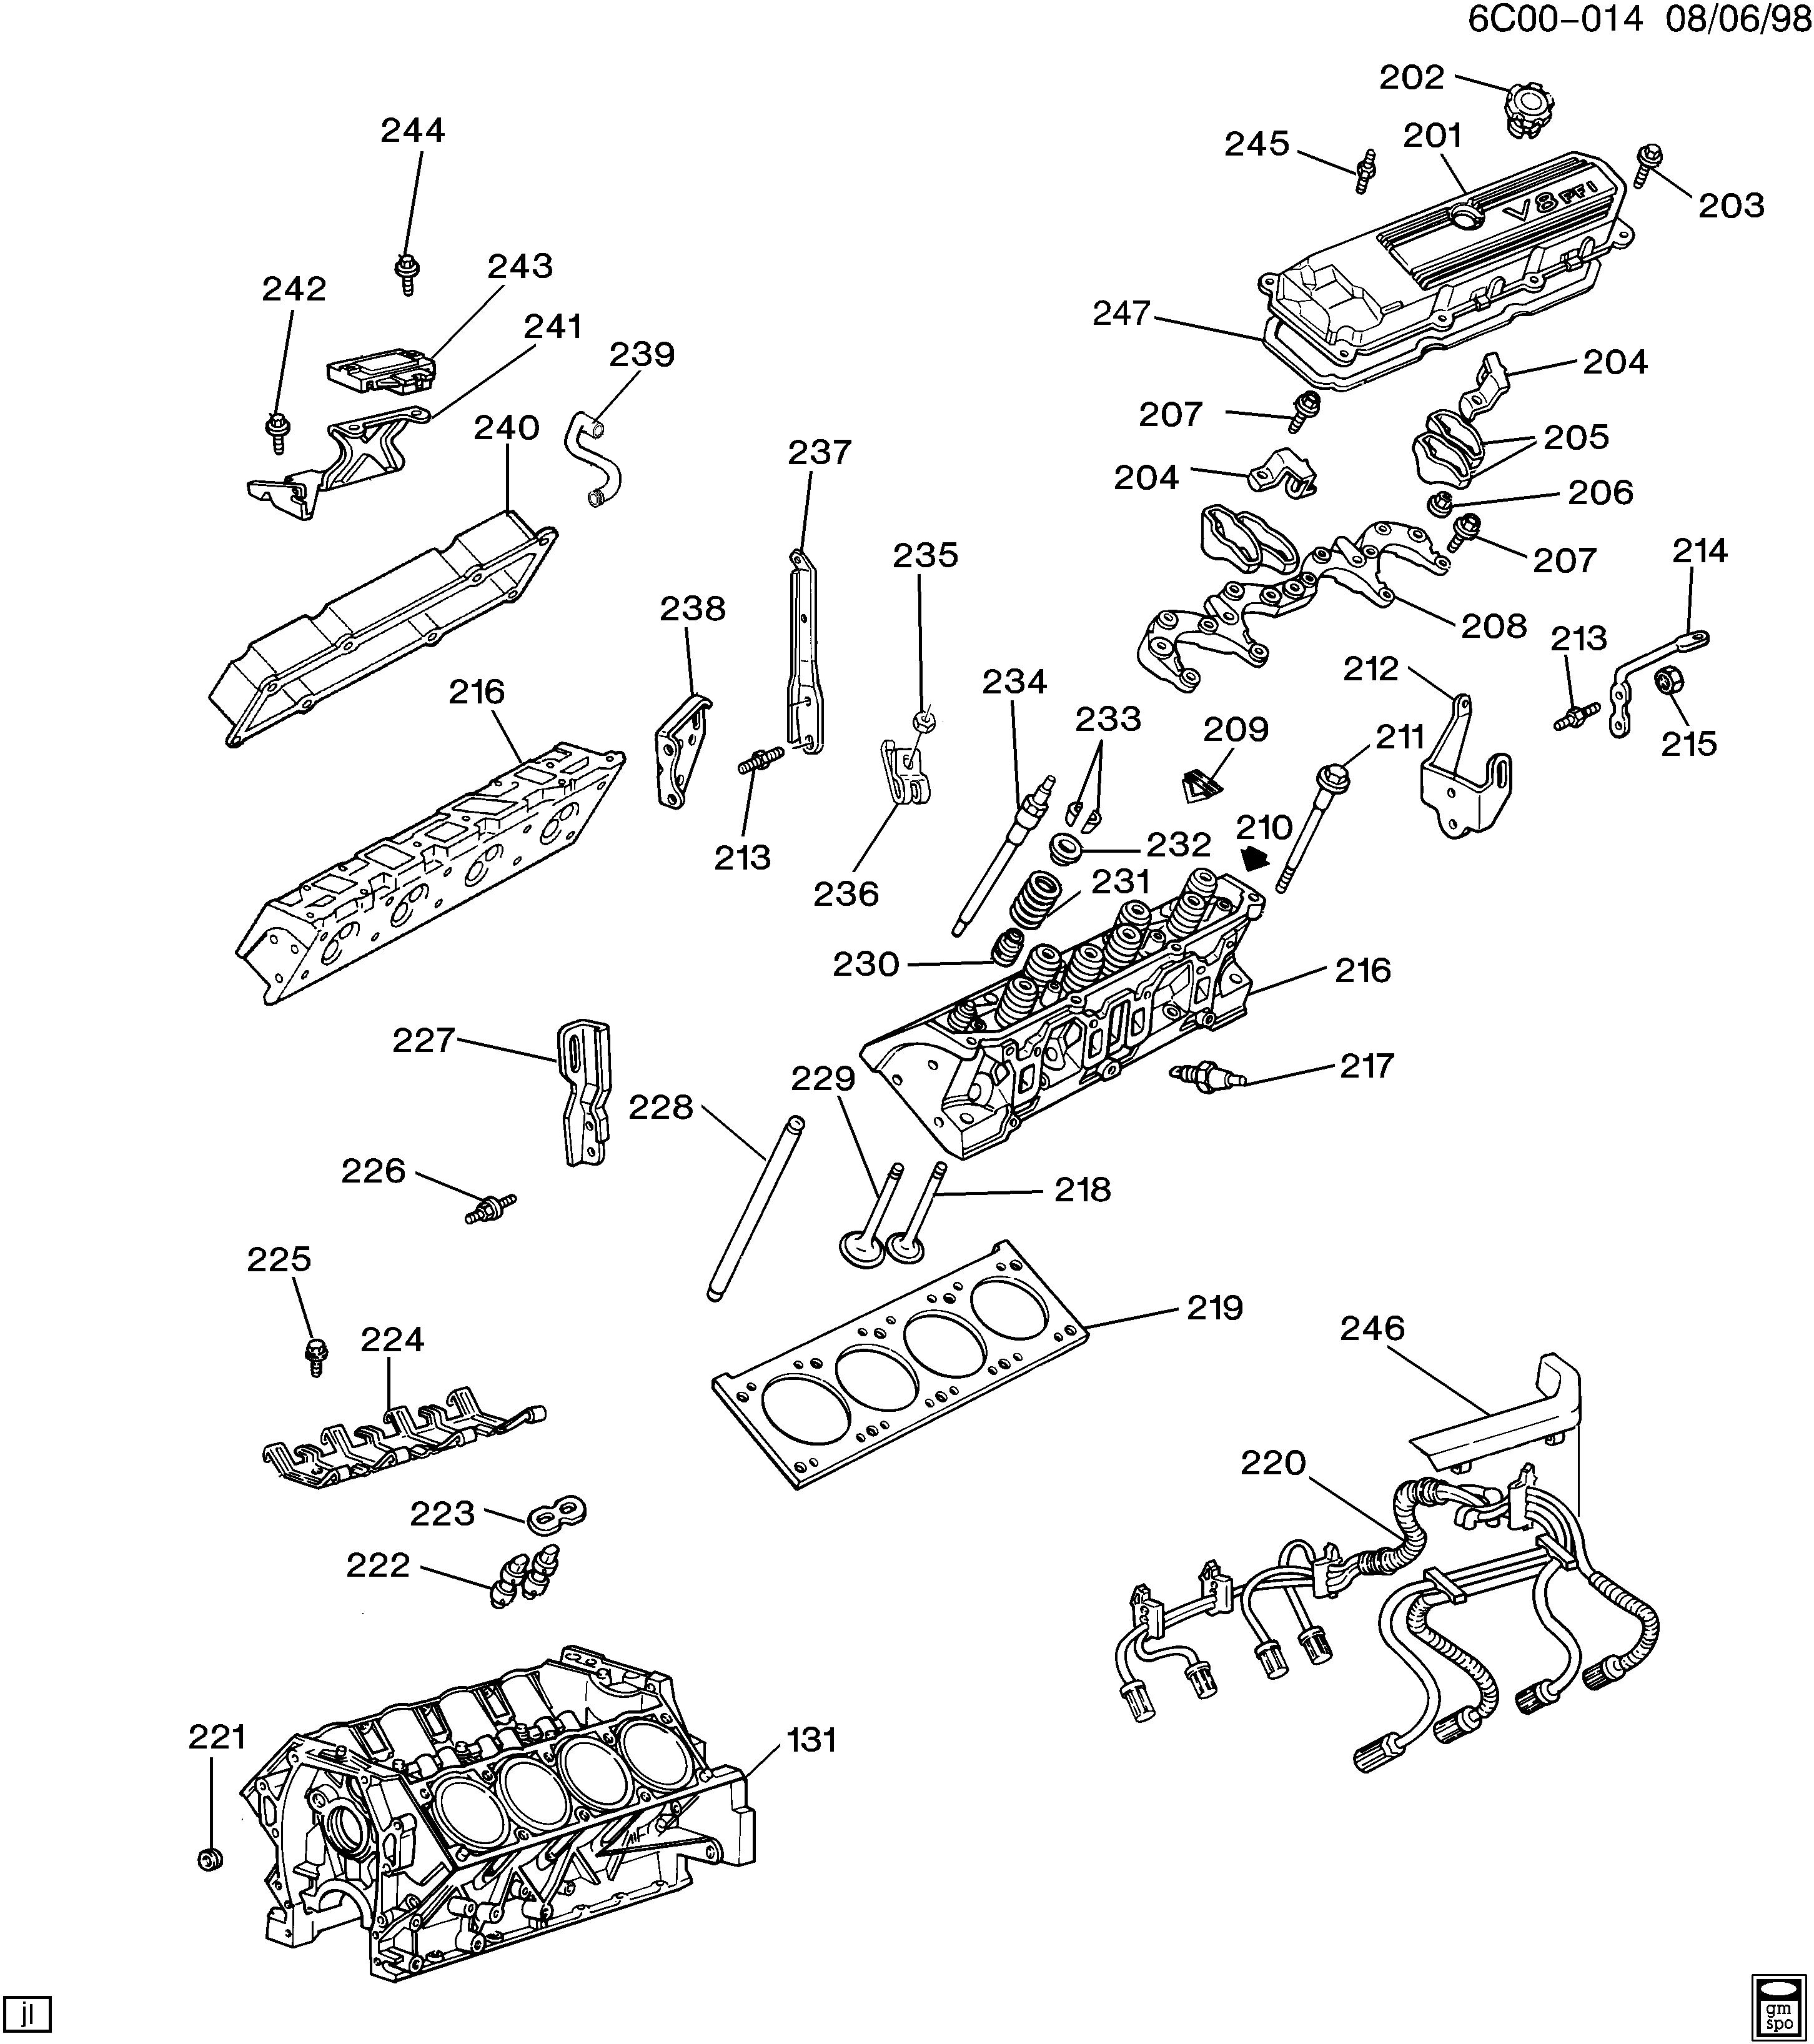 cadillac deville - c engine asm-4.9l v8 part 2 cylinder head & related parts  (l26/4.9b) > epc online > nemiga.com  parts catalogs